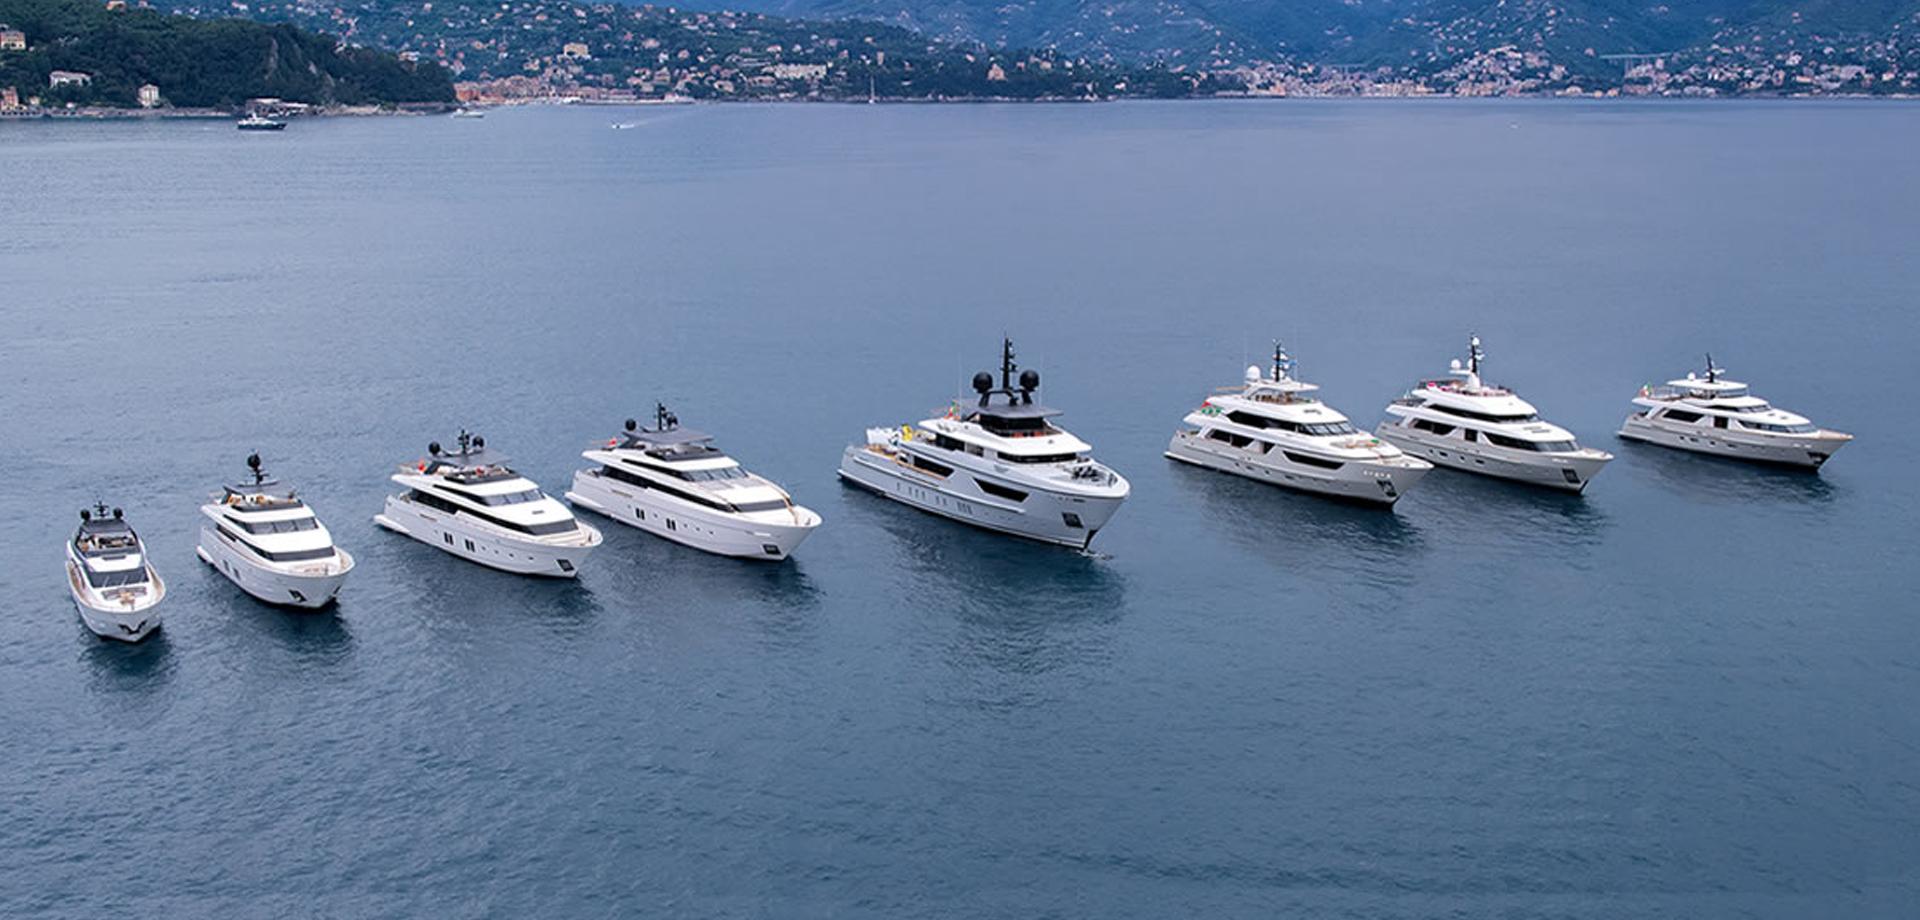 Ulrich Heesen yacht charter boat search luxury yachts sailboat catamarans